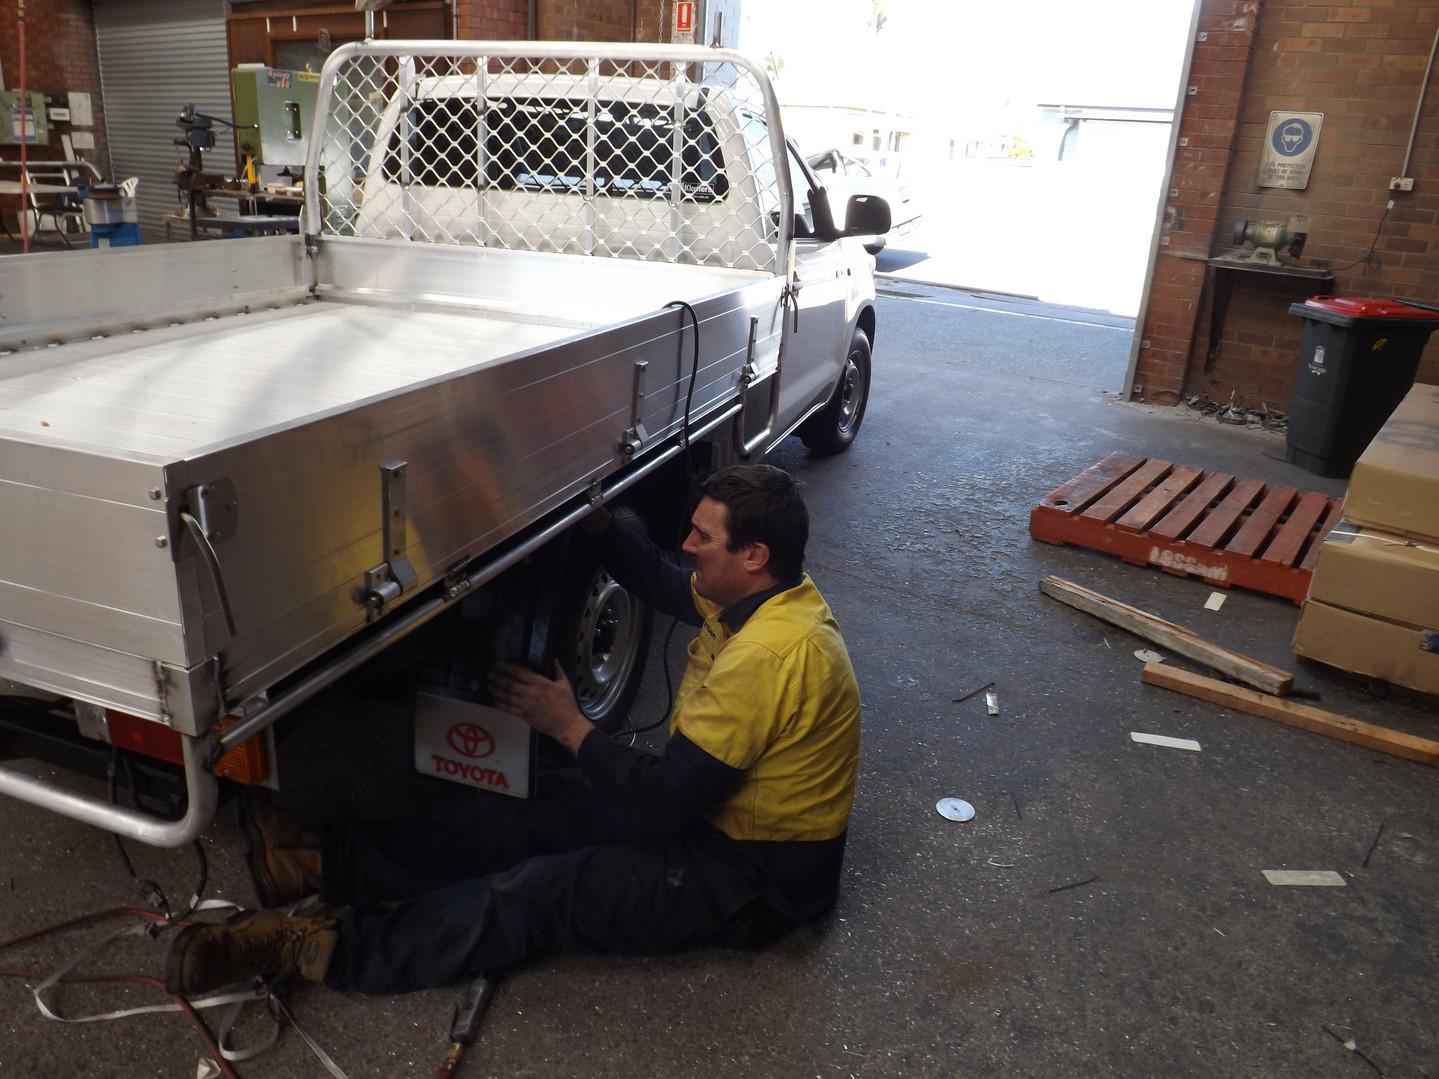 Stu conducting repairs